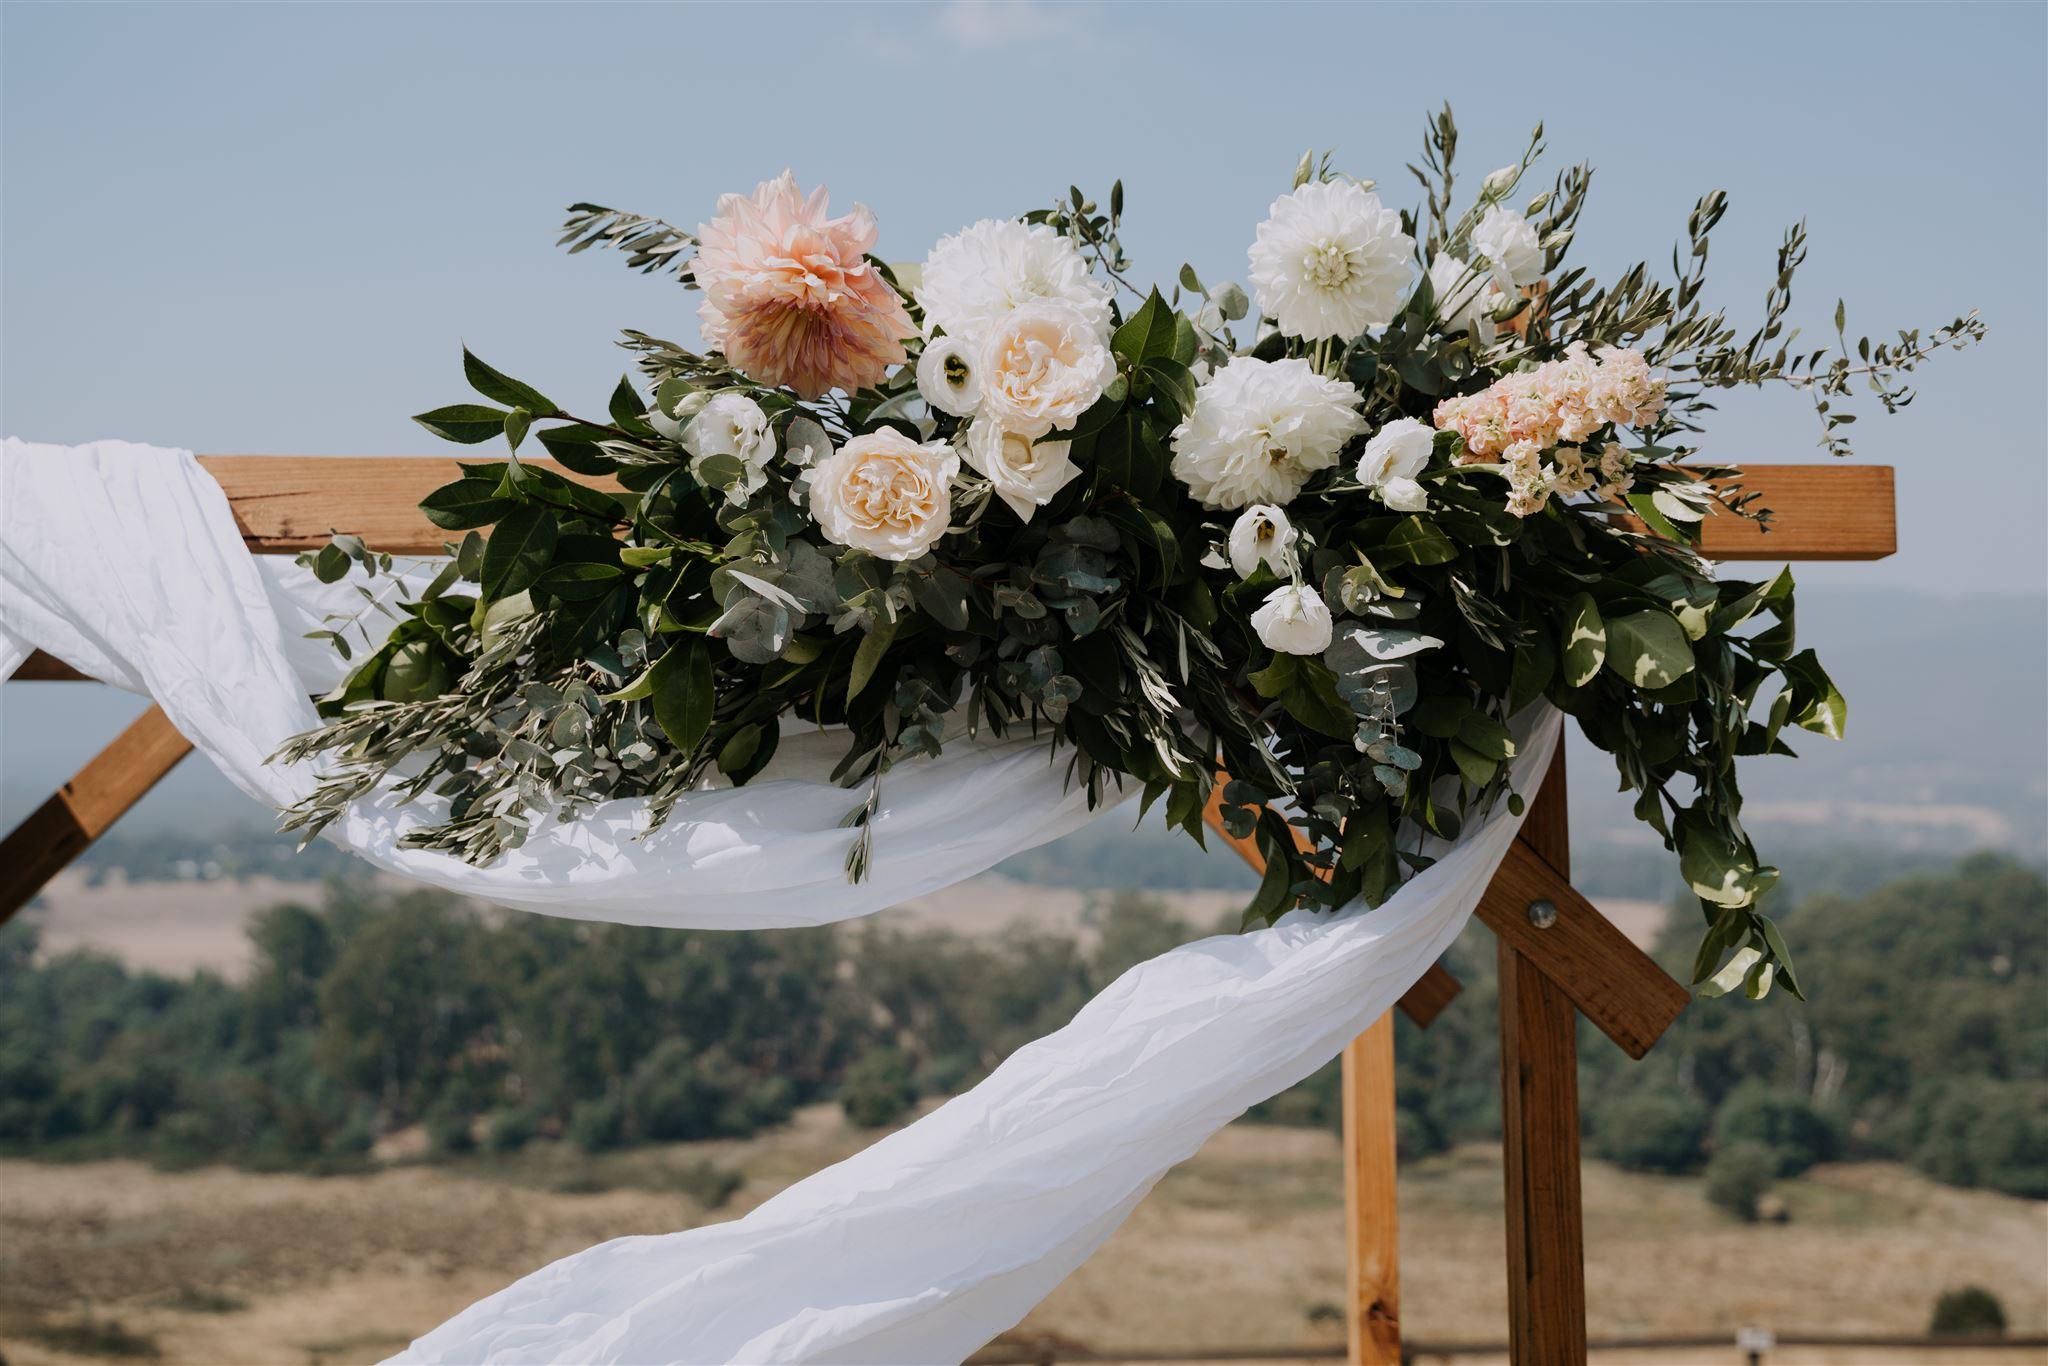 Penny-and-Neil-Riverstone-Estate-Wedding-0013_websize.jpg